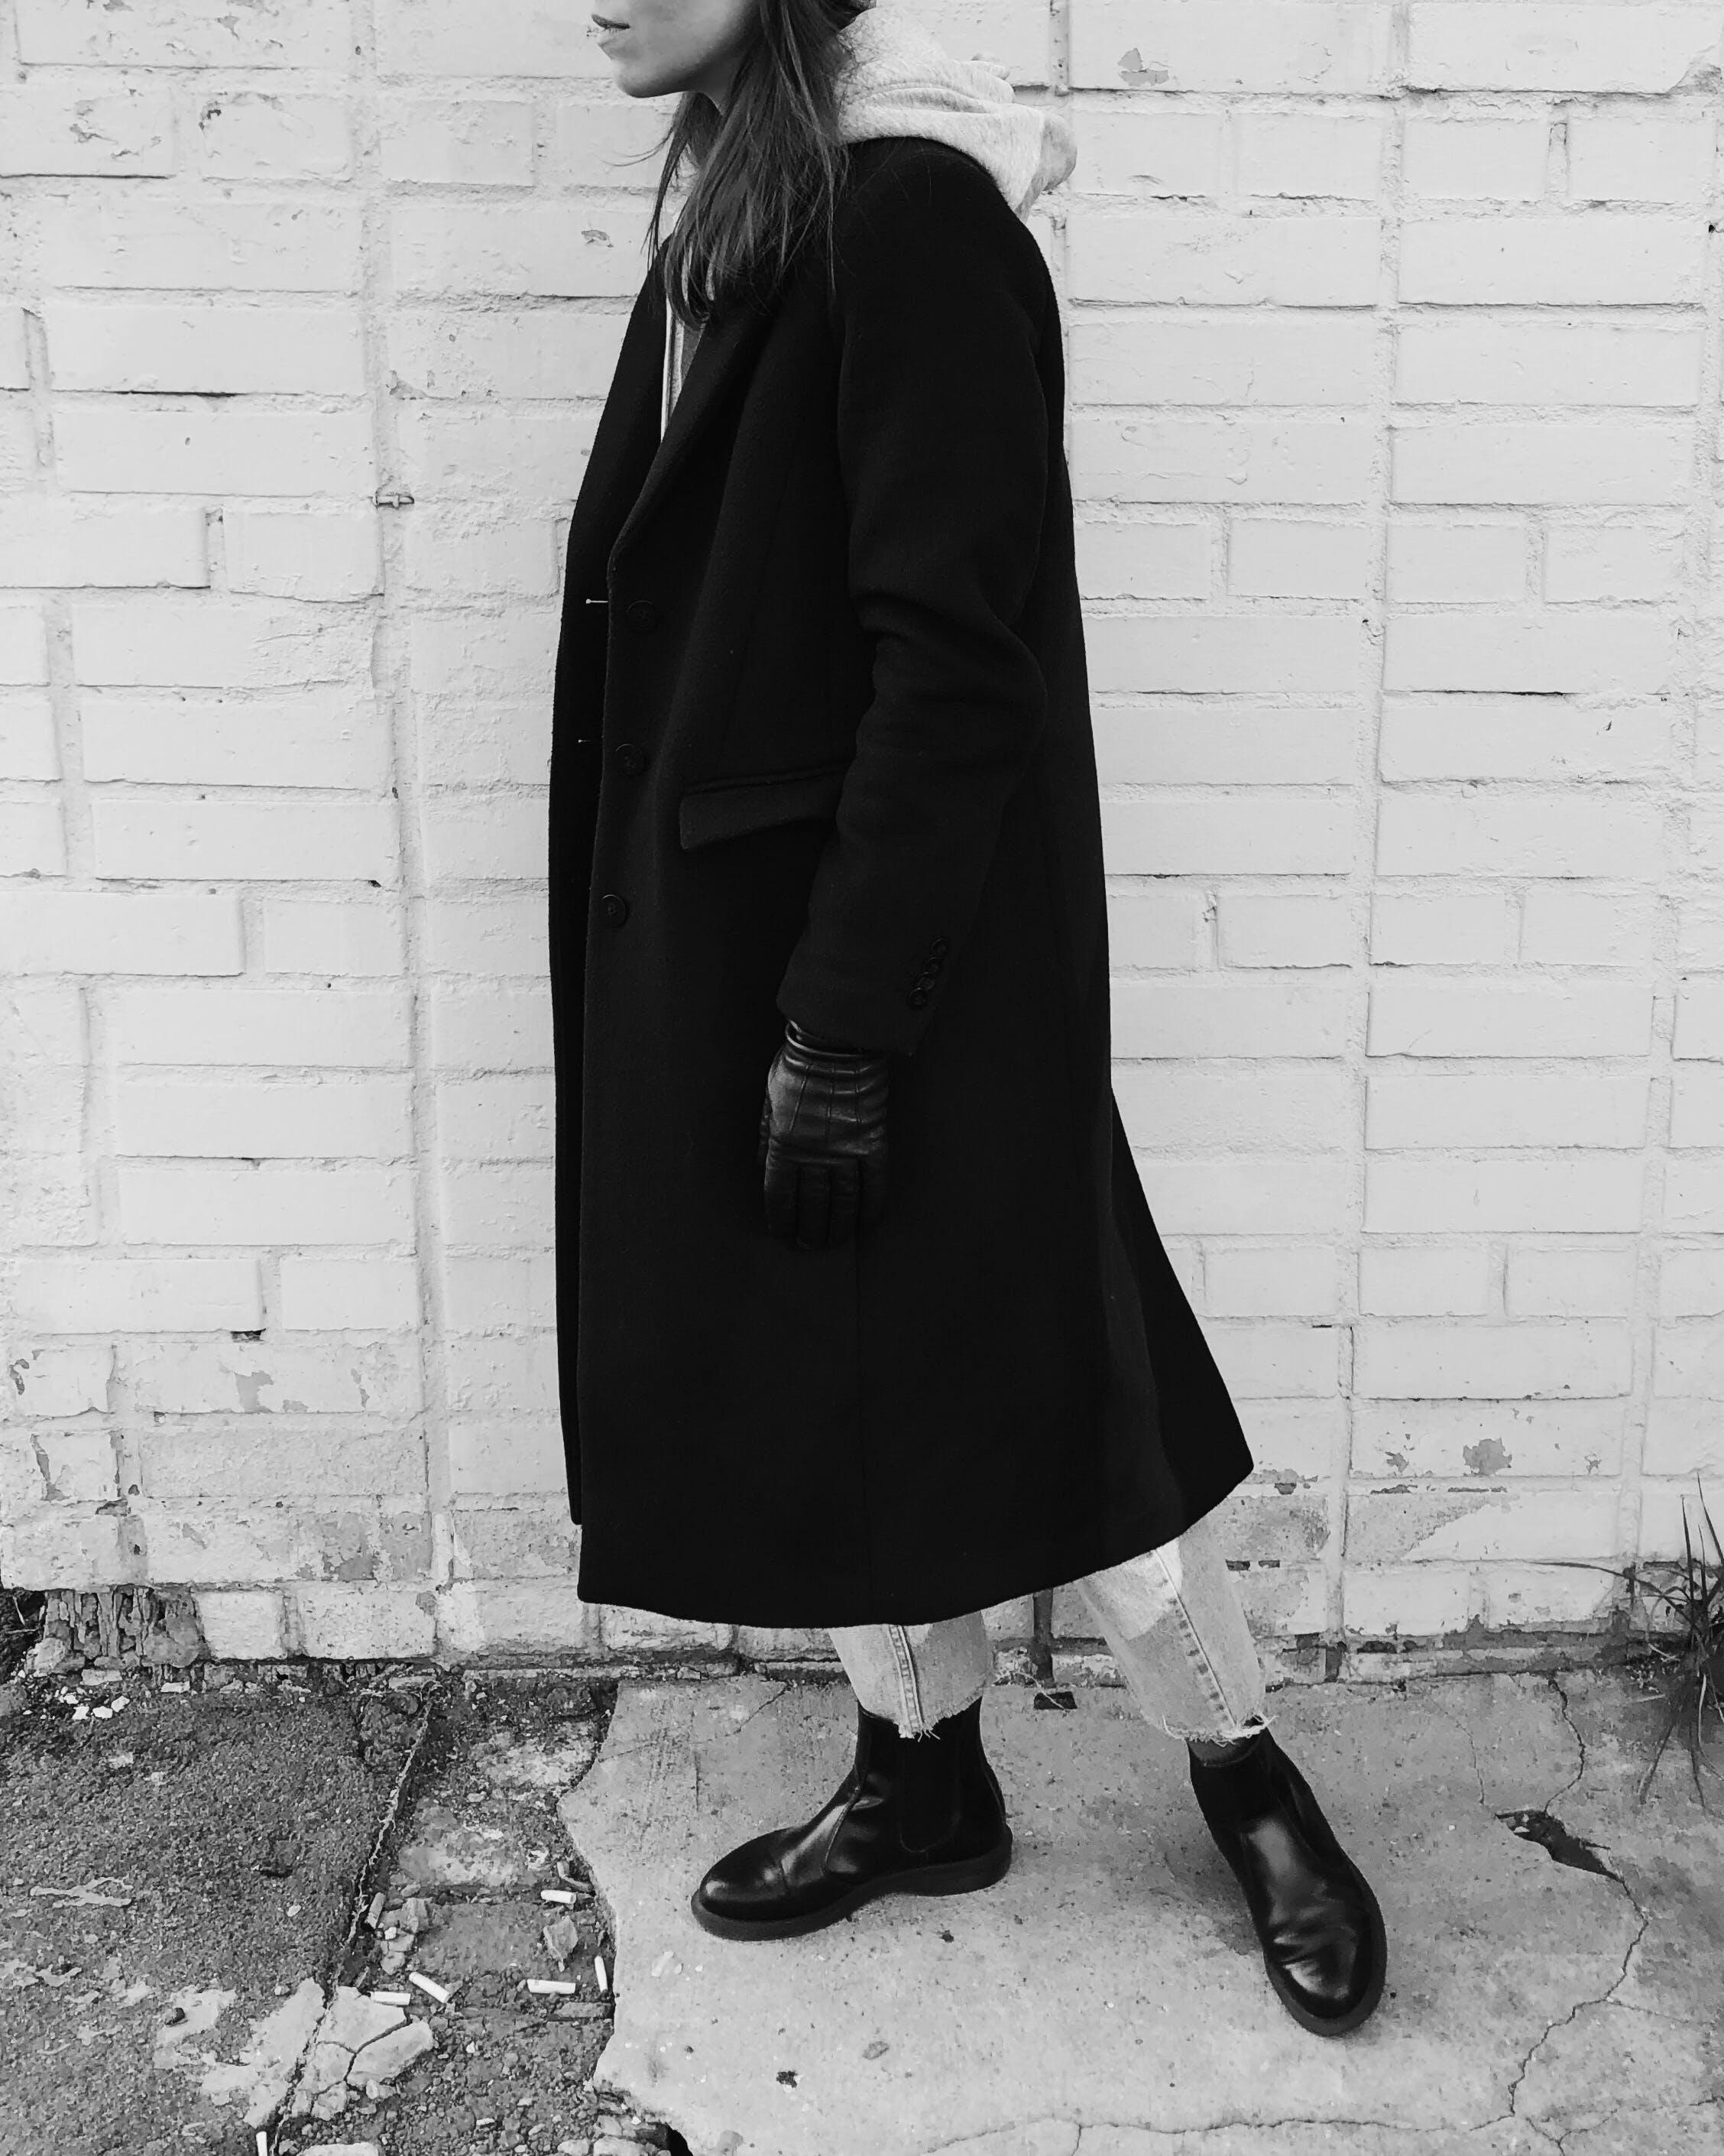 Kostenloses Stock Foto zu dame, draußen, fashion, feminin